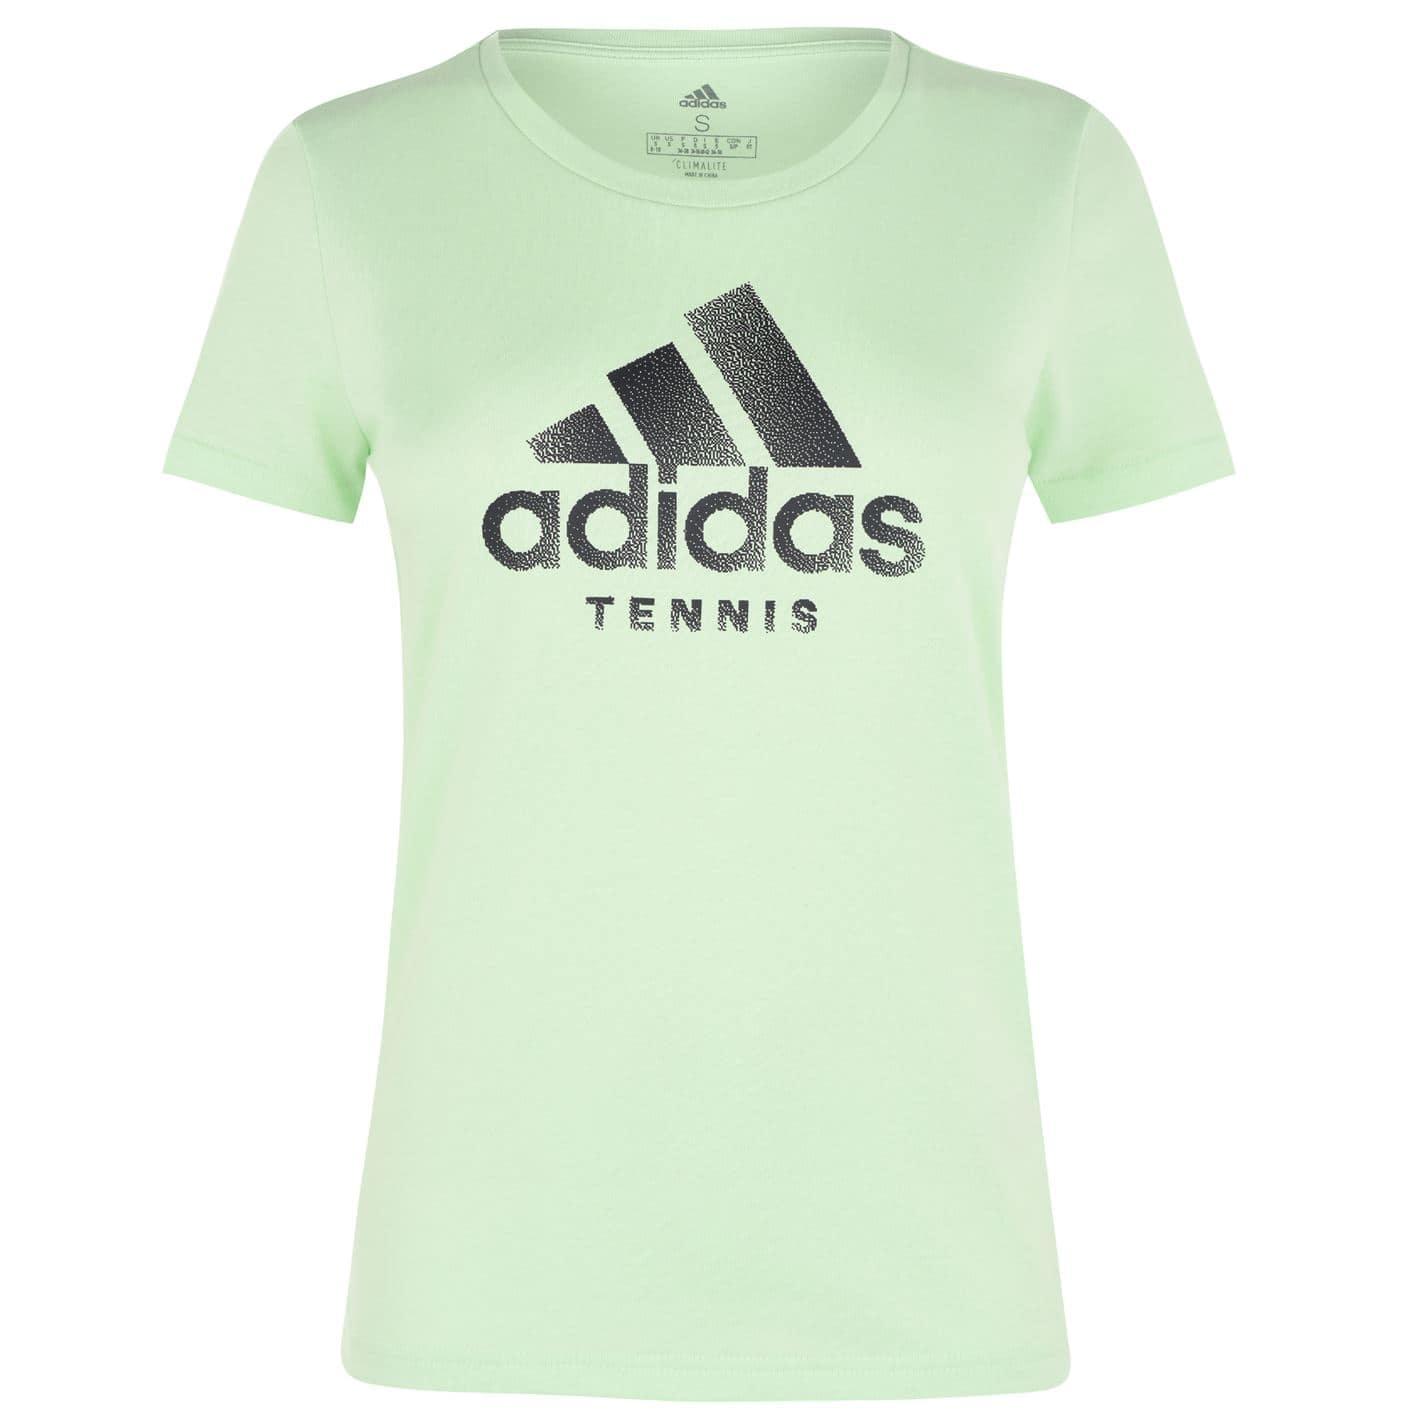 Adidas Category Tennis T Shirt